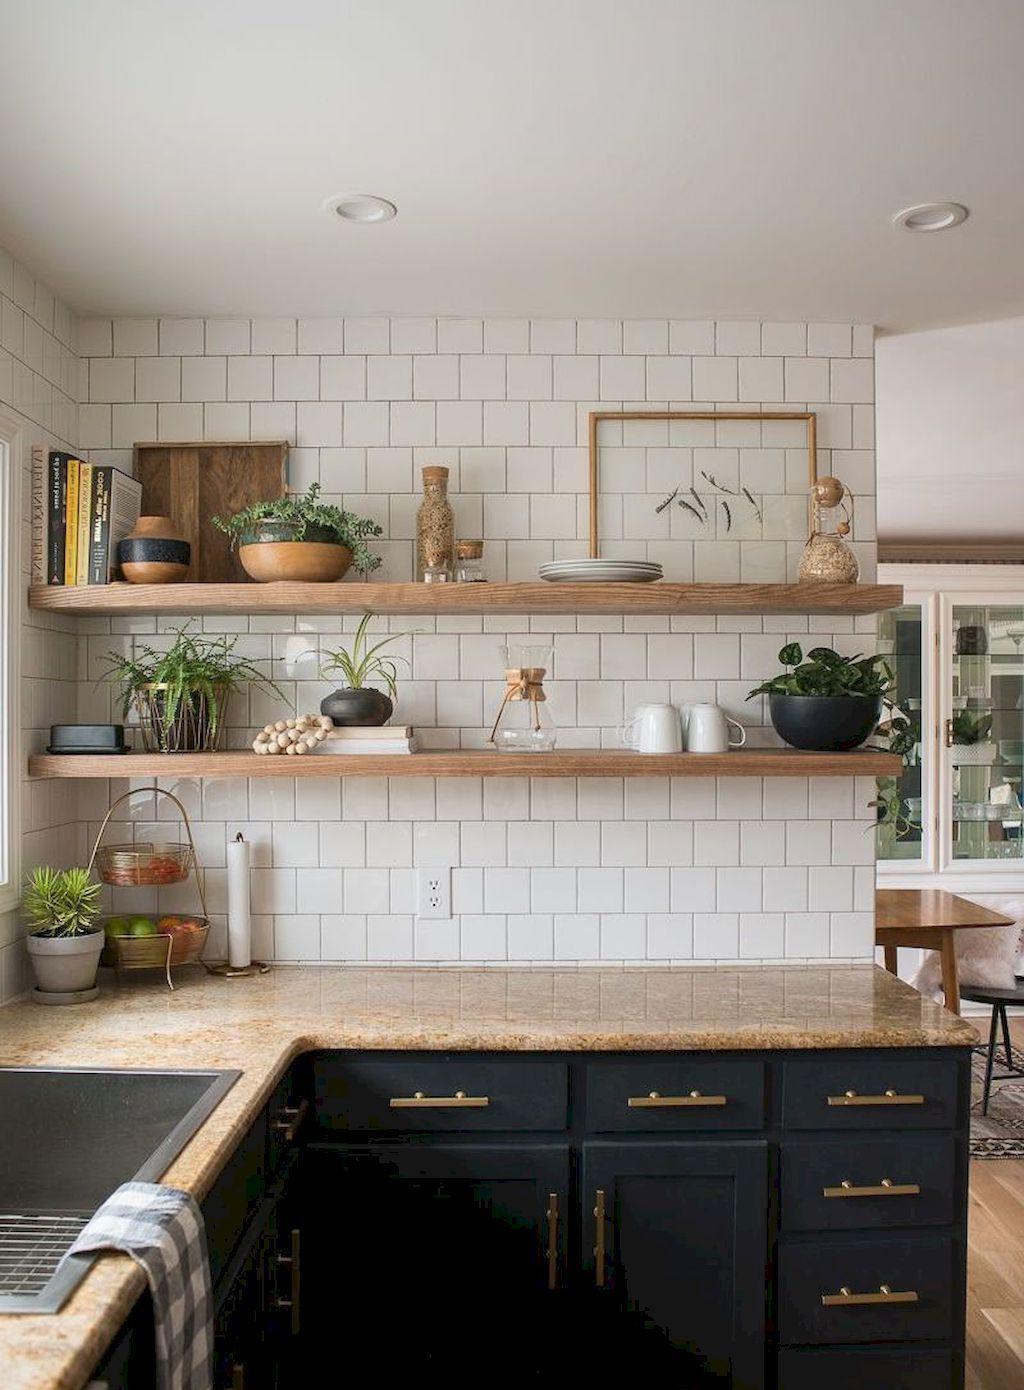 Open Shelving Kitchen Design Ideas Decor Around The World In 2020 Kitchen Remodel Small Kitchen Interior Diy Kitchen Renovation